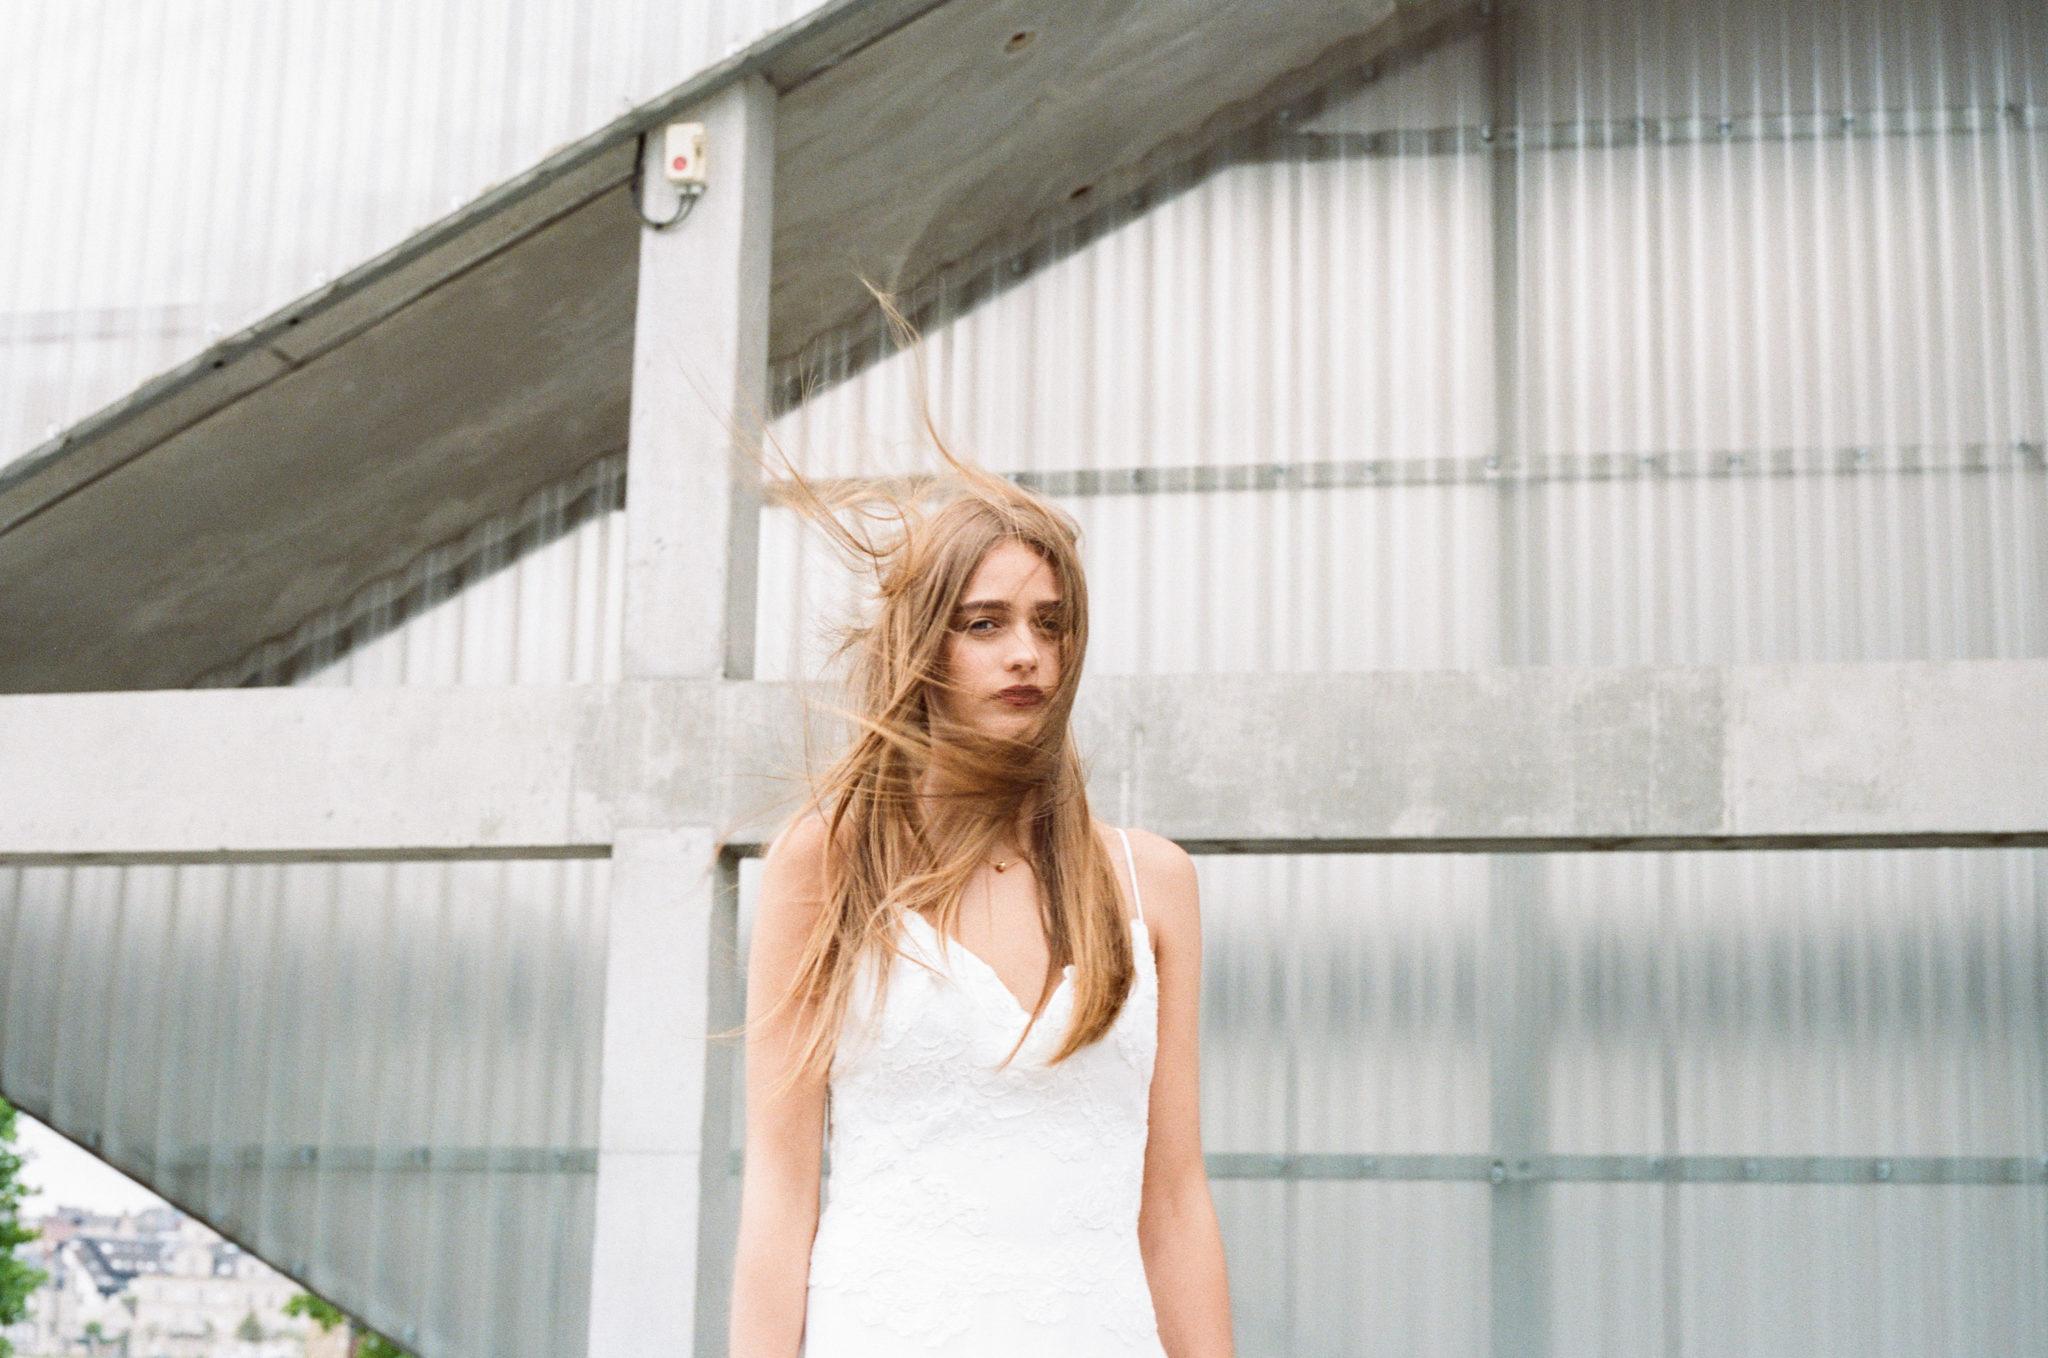 Le Wedding Urban Brides robe Cymbeline Paris Presqu'île le MRI Dôme Caen